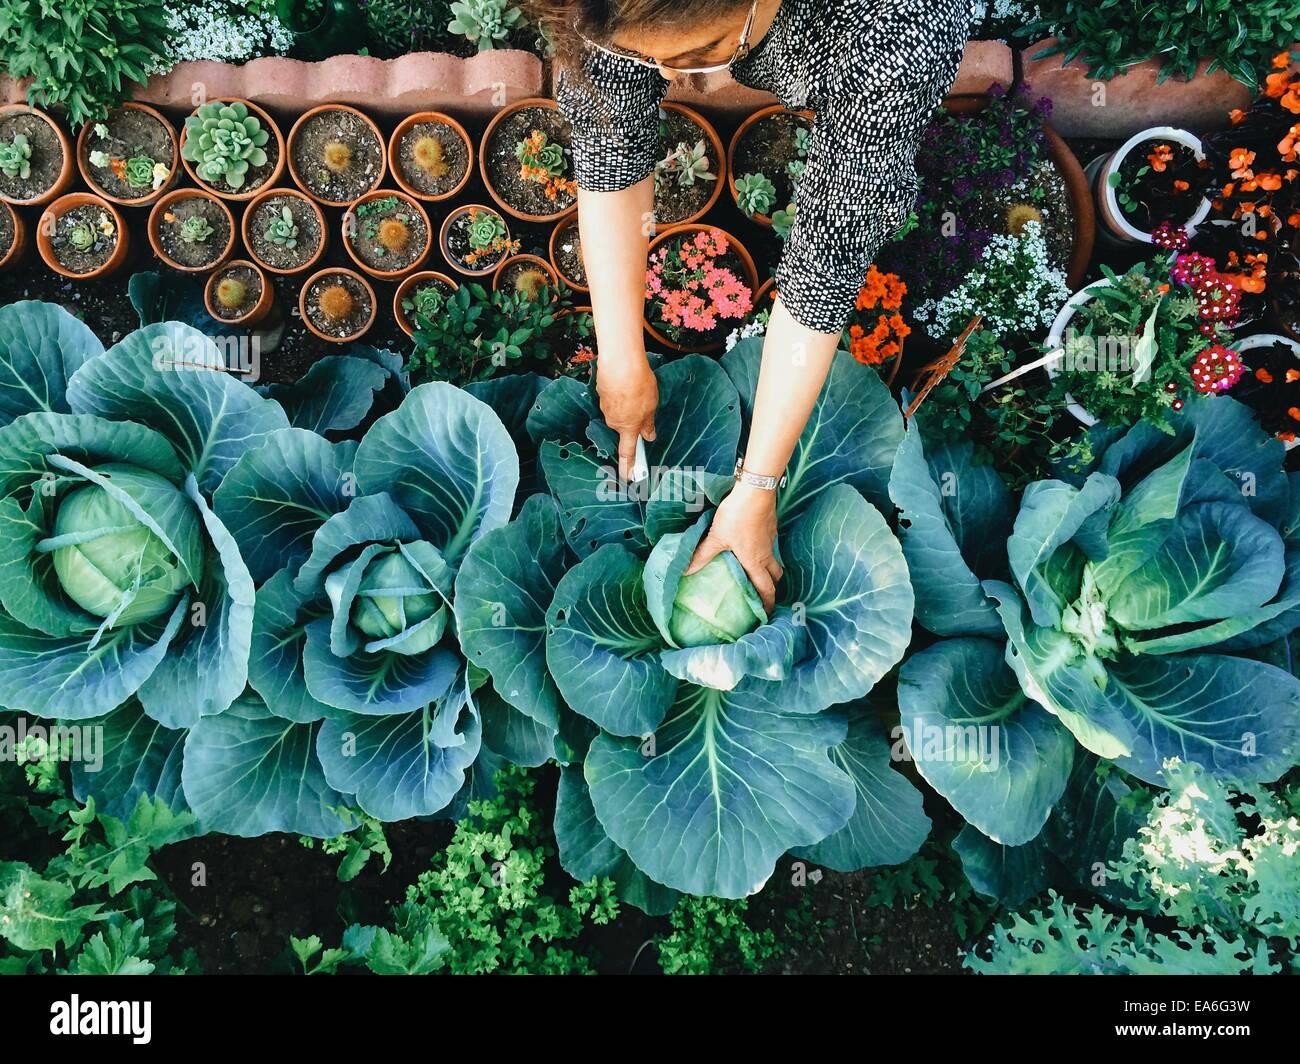 USA, California, Santa Clara County, Woman working in vegetable garden - Stock Image